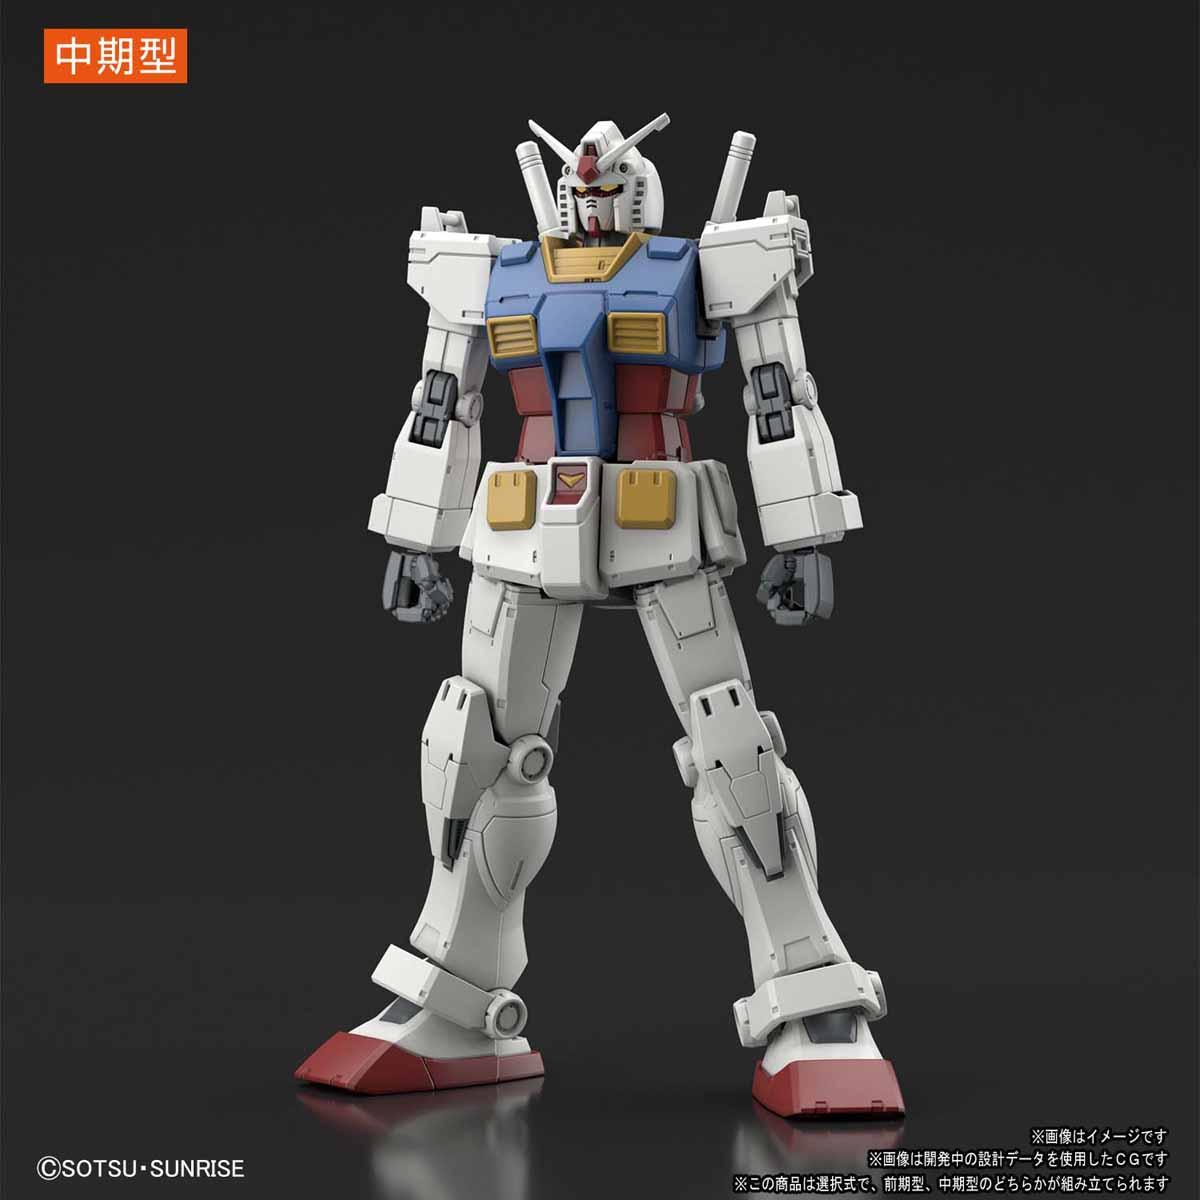 HG 1/144『RX-78-02 ガンダム(GUNDAM THE ORIGIN版)』プラモデル-003